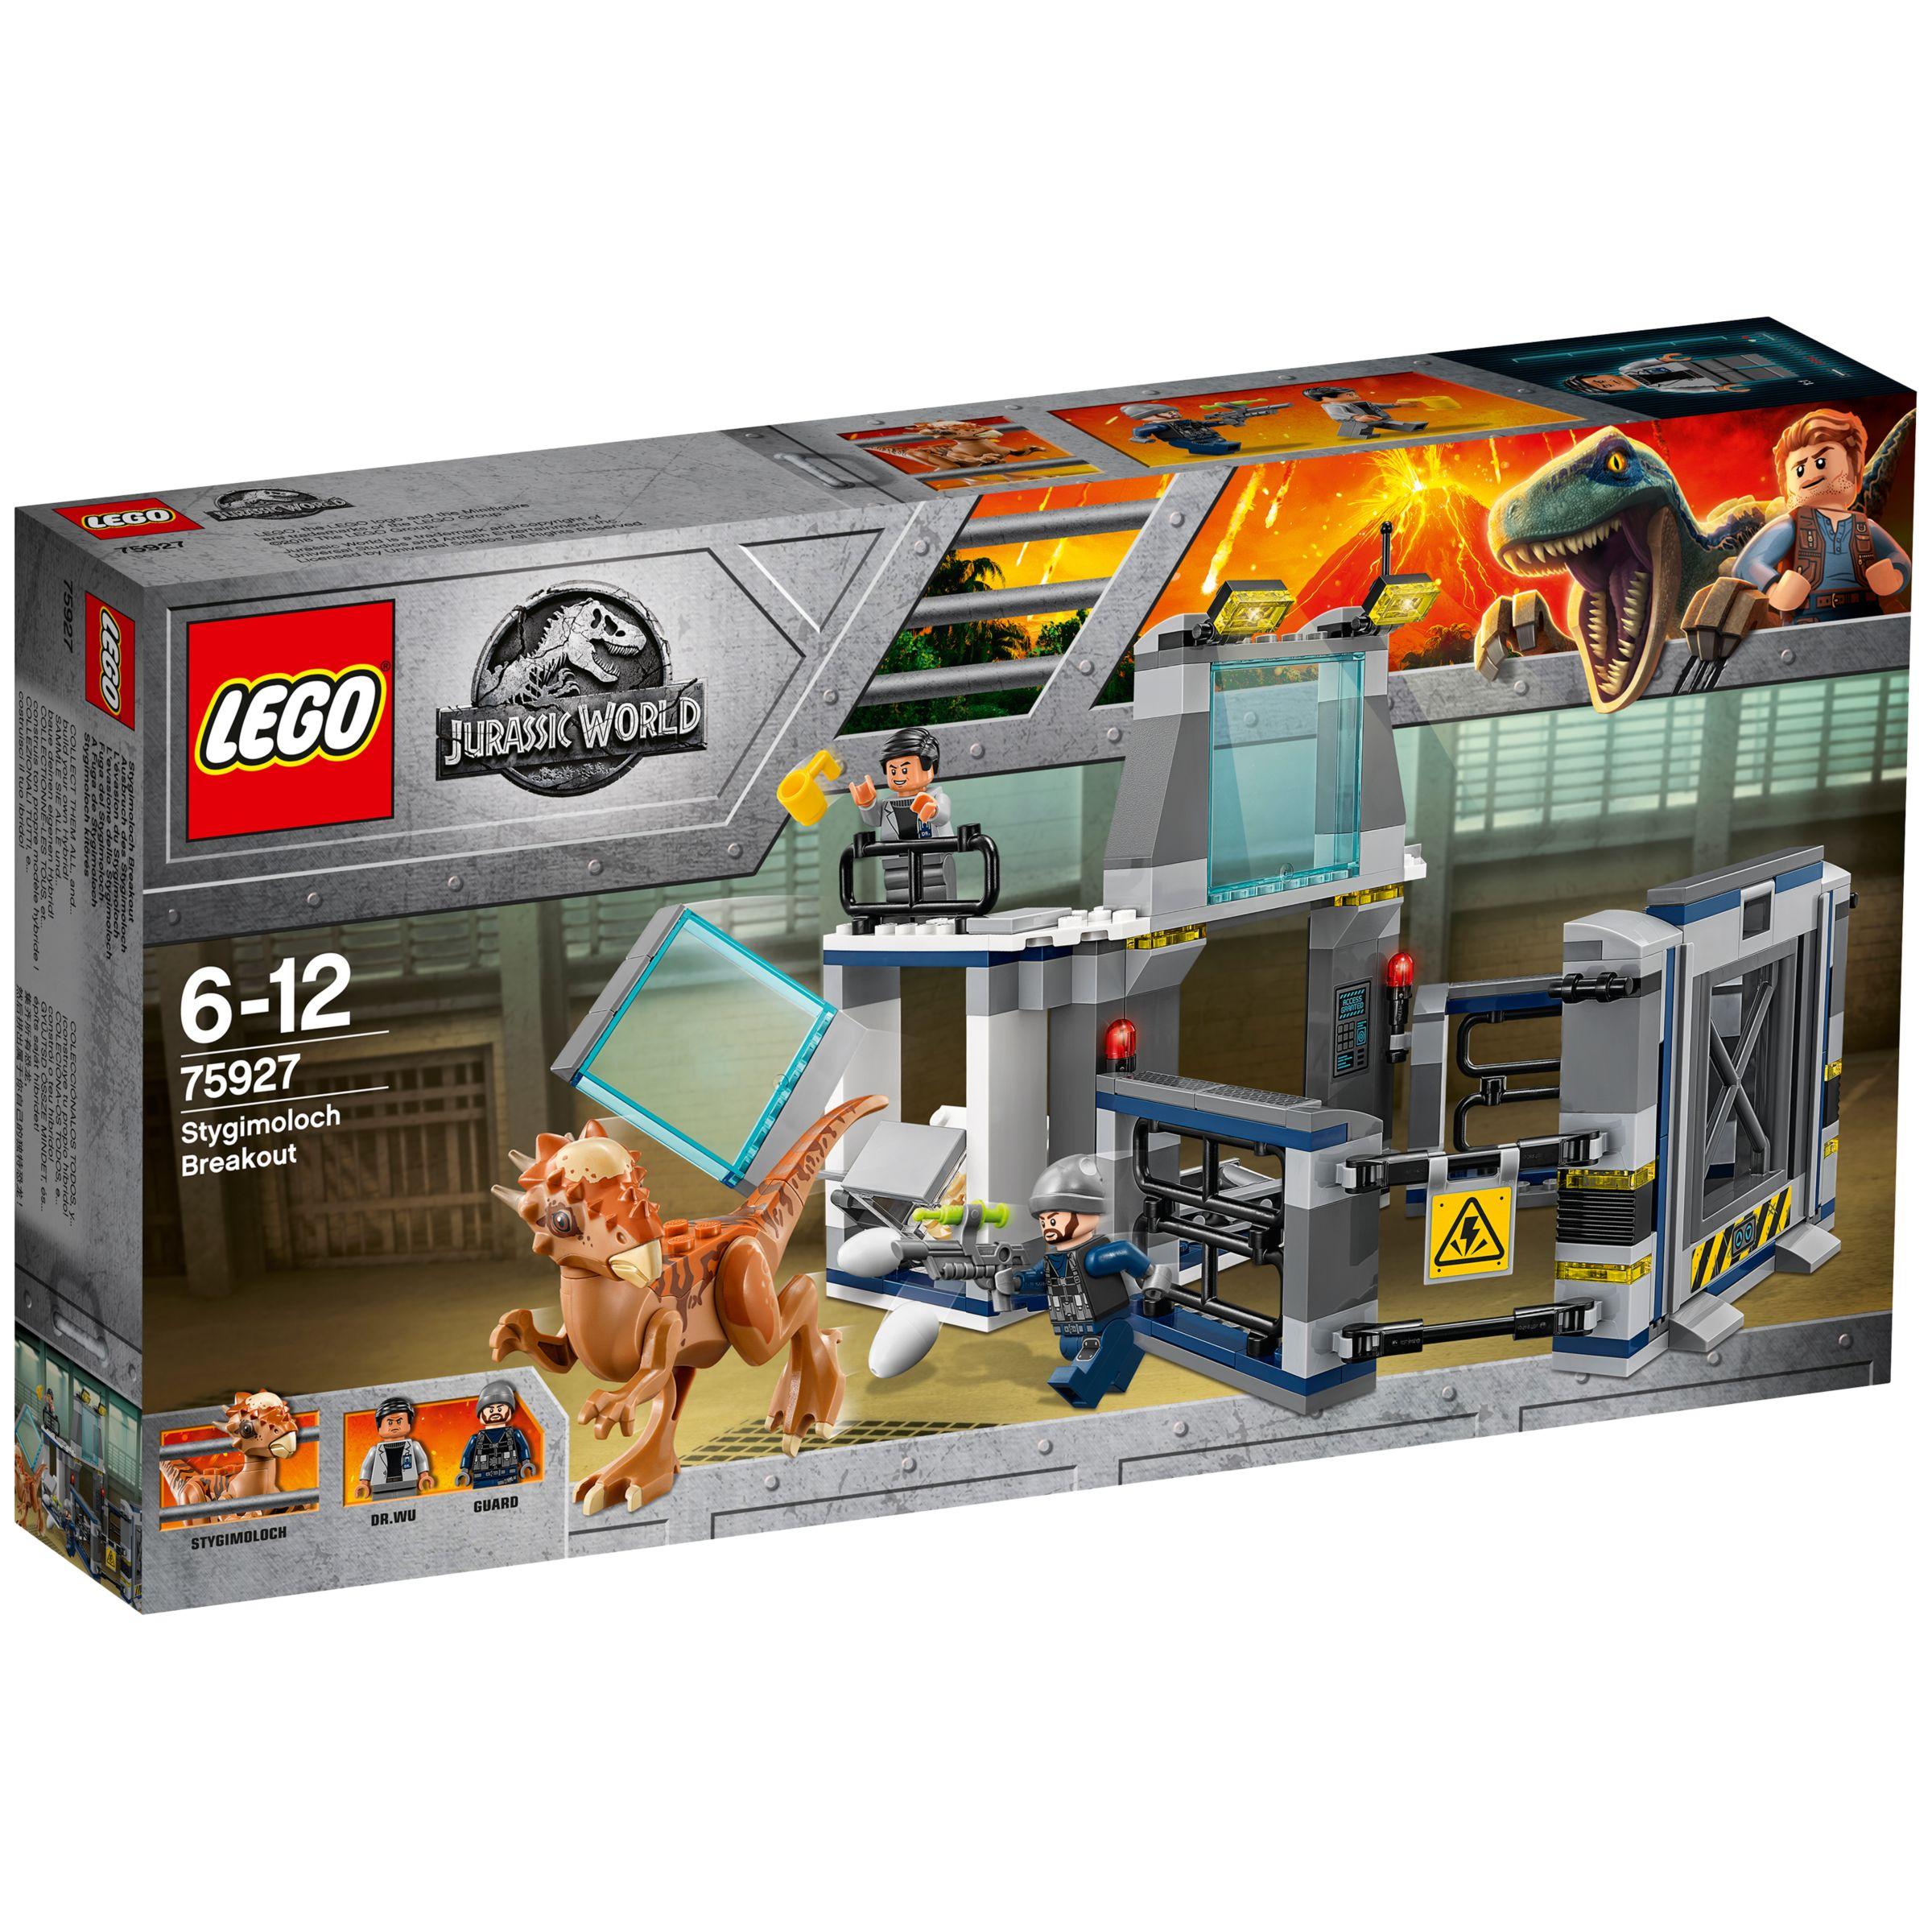 LEGO Juniors 75927 Jurassic World Stygimoloch Breakout